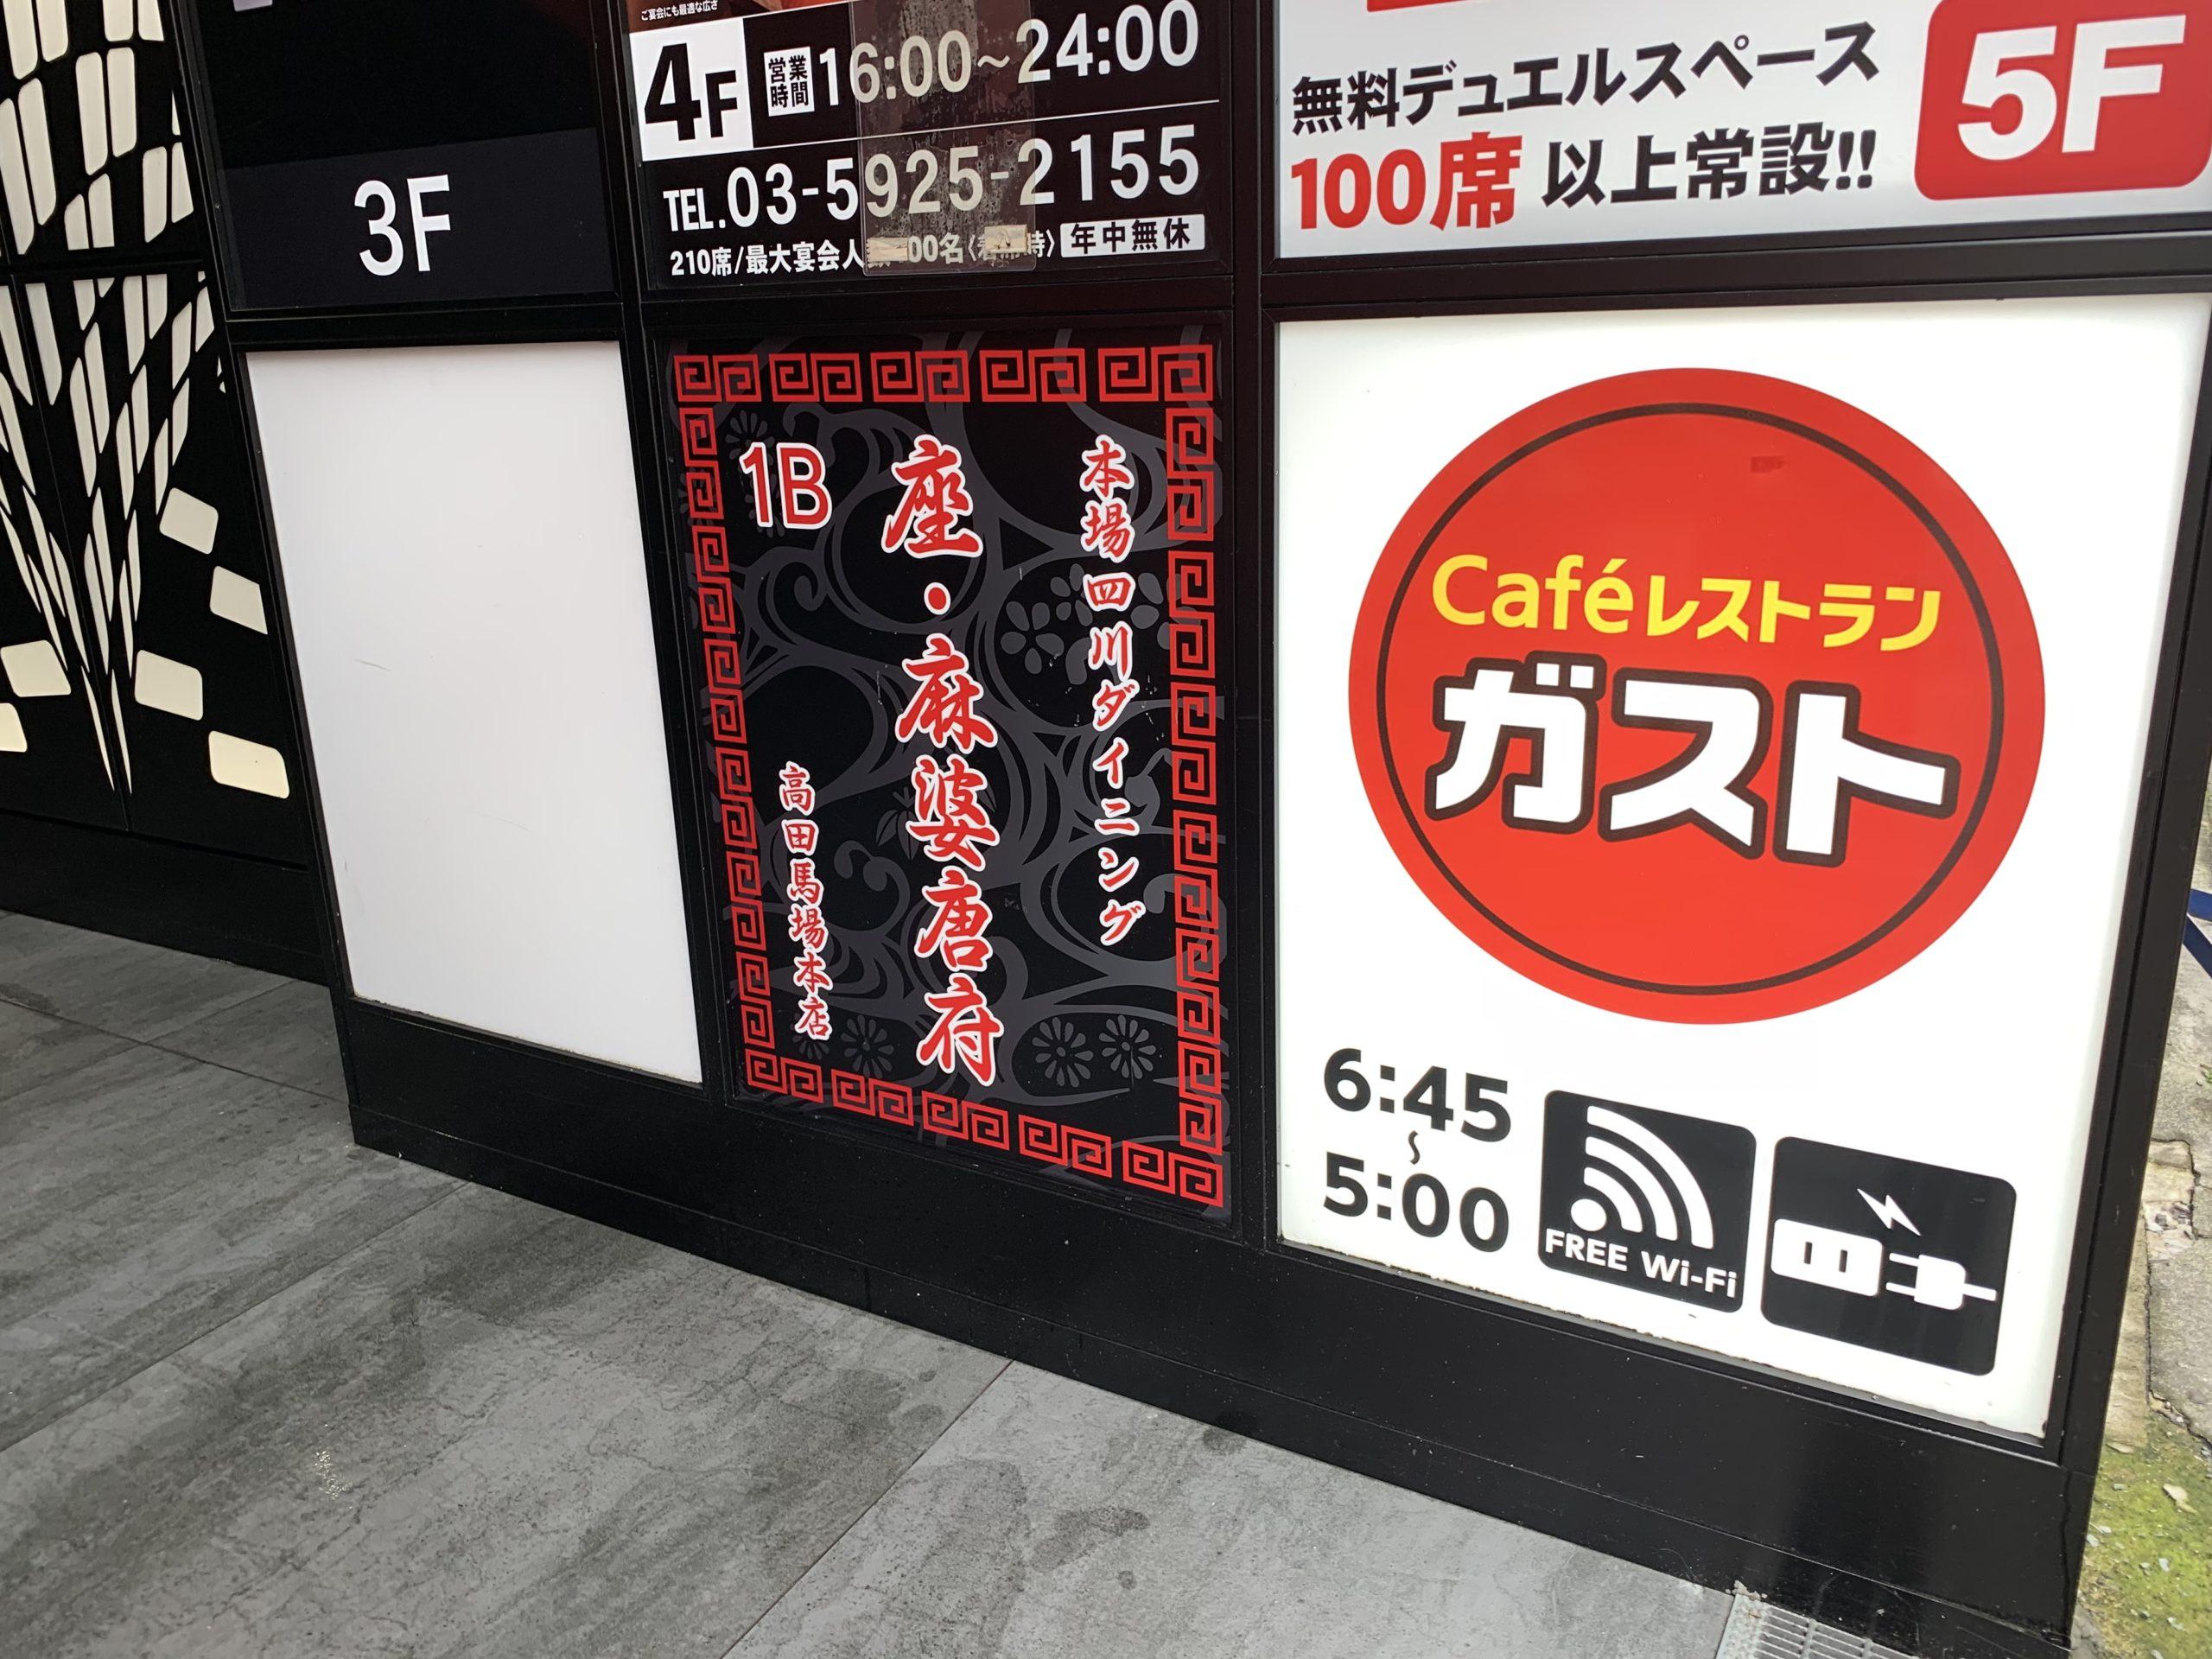 高田馬場駅早稲田口 電源カフェ ガスト 高田馬場西口店 Wi-Fi